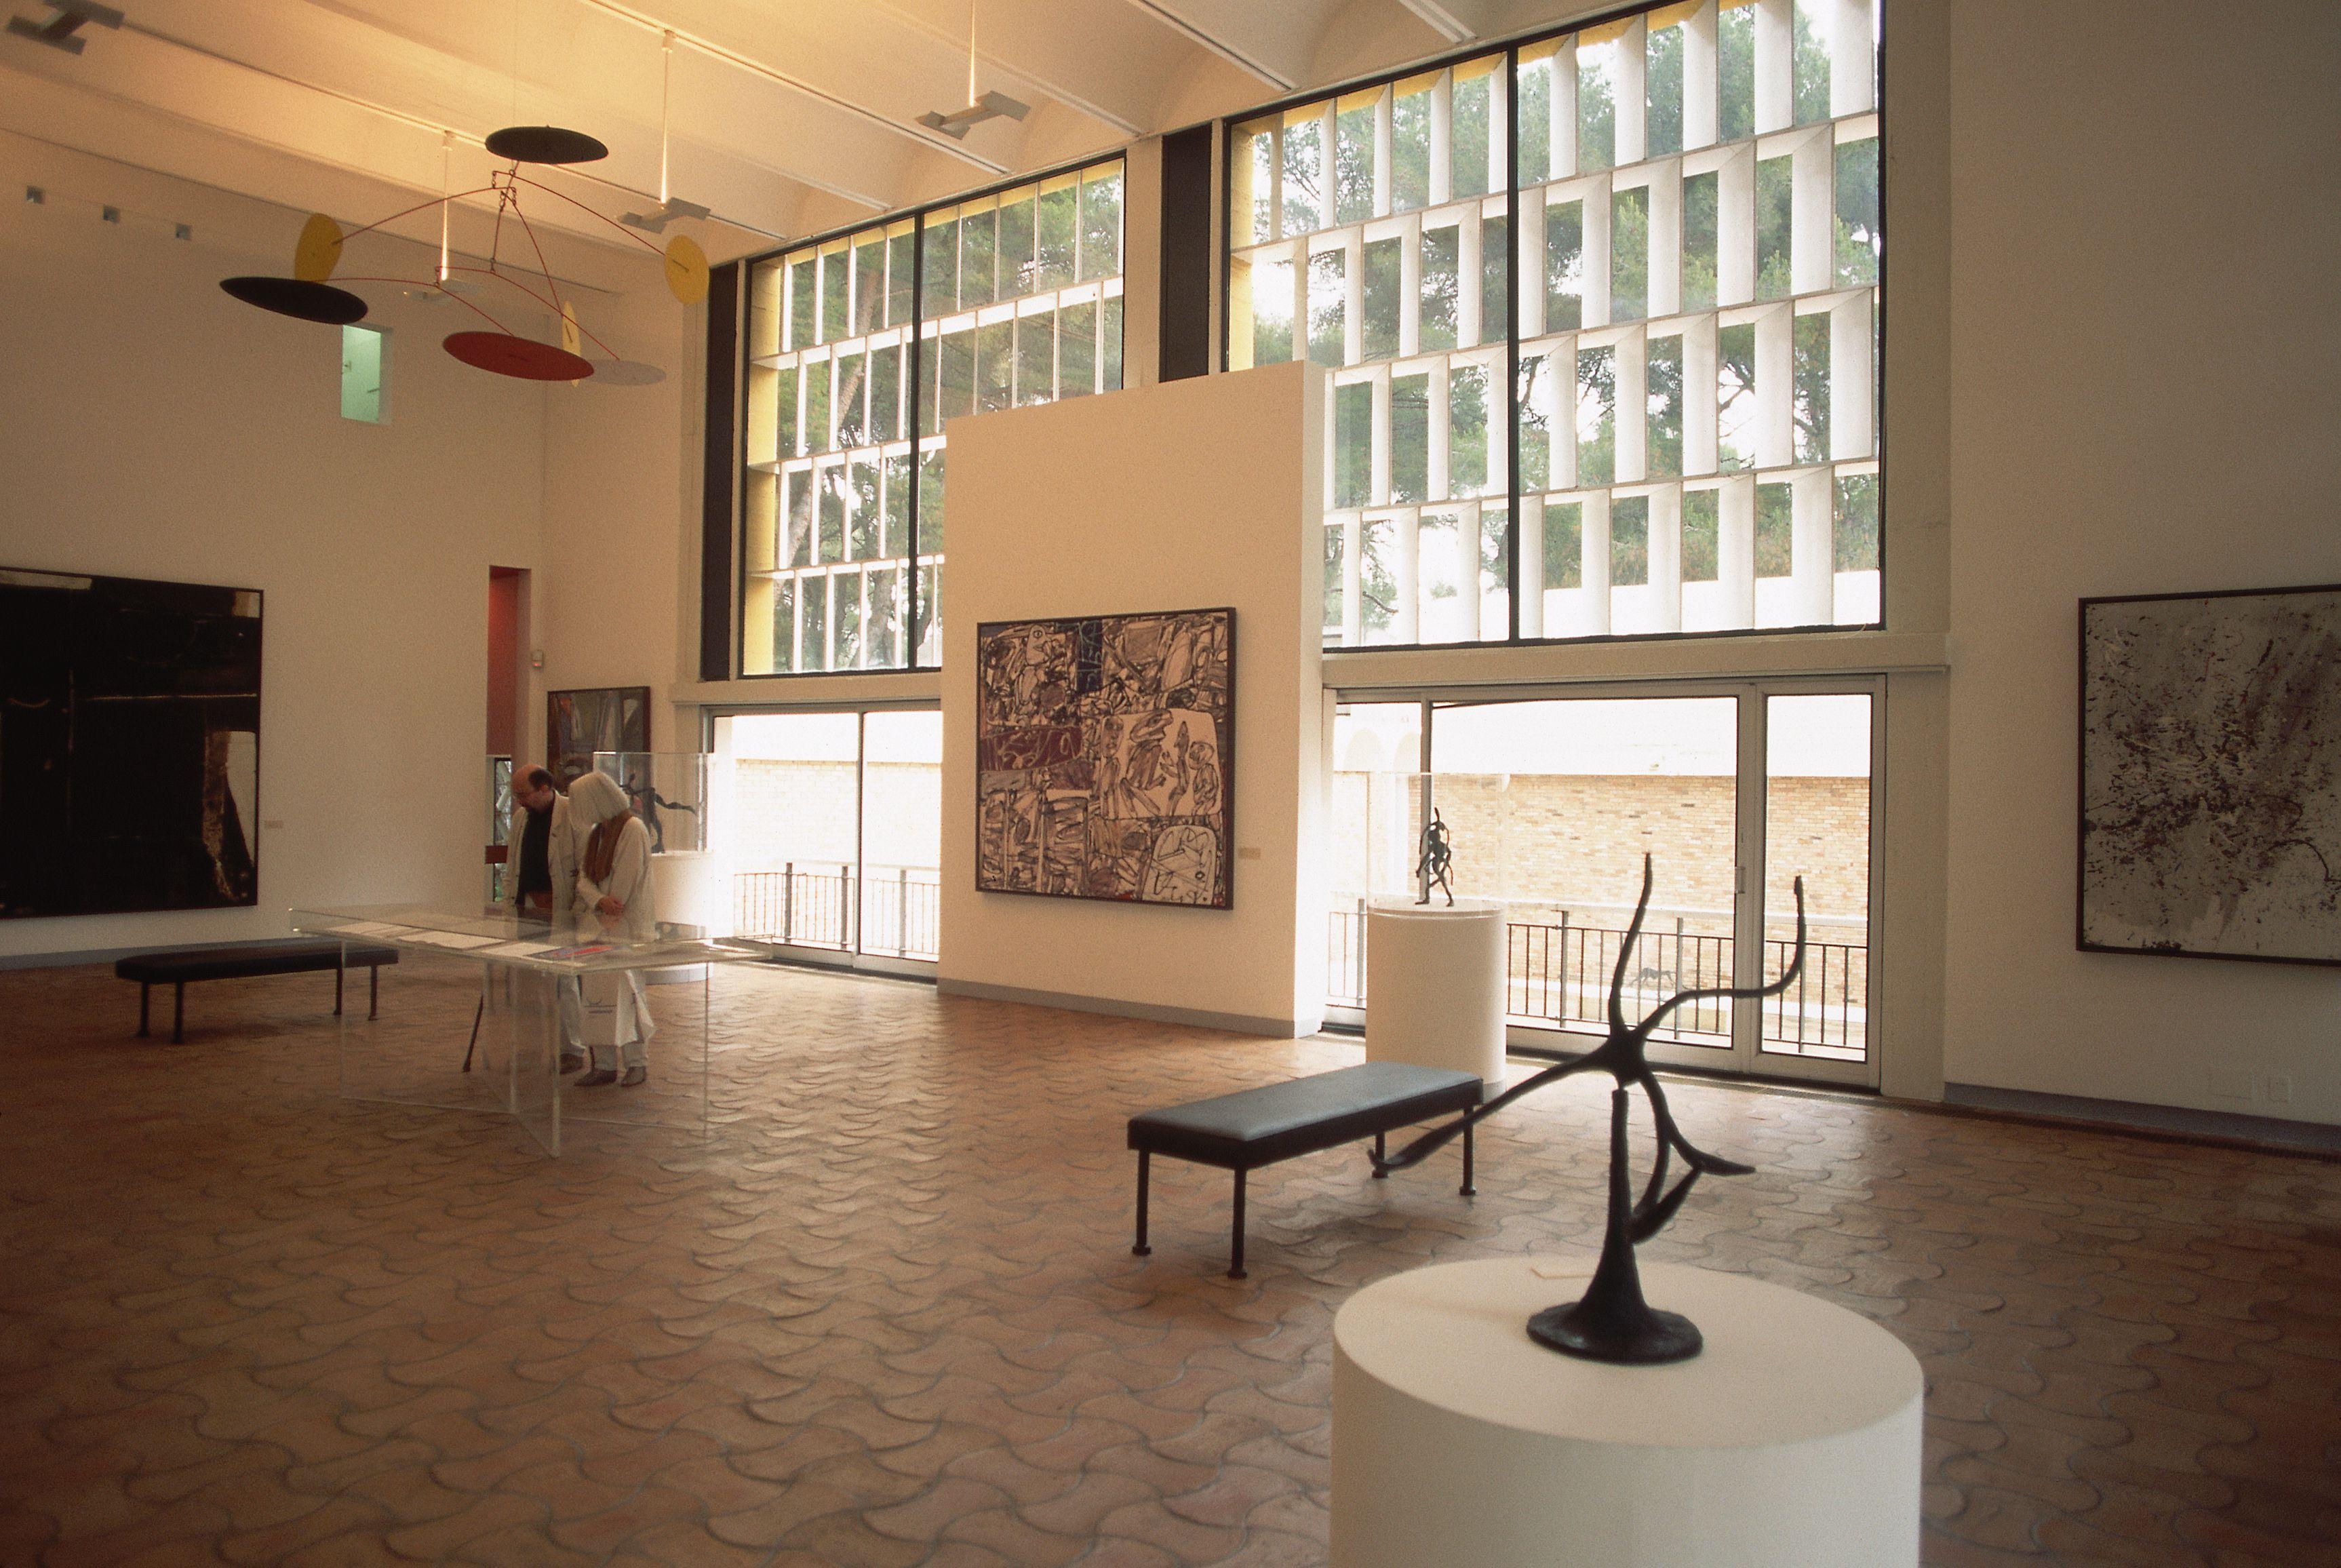 Gallery in Fondation Maeght